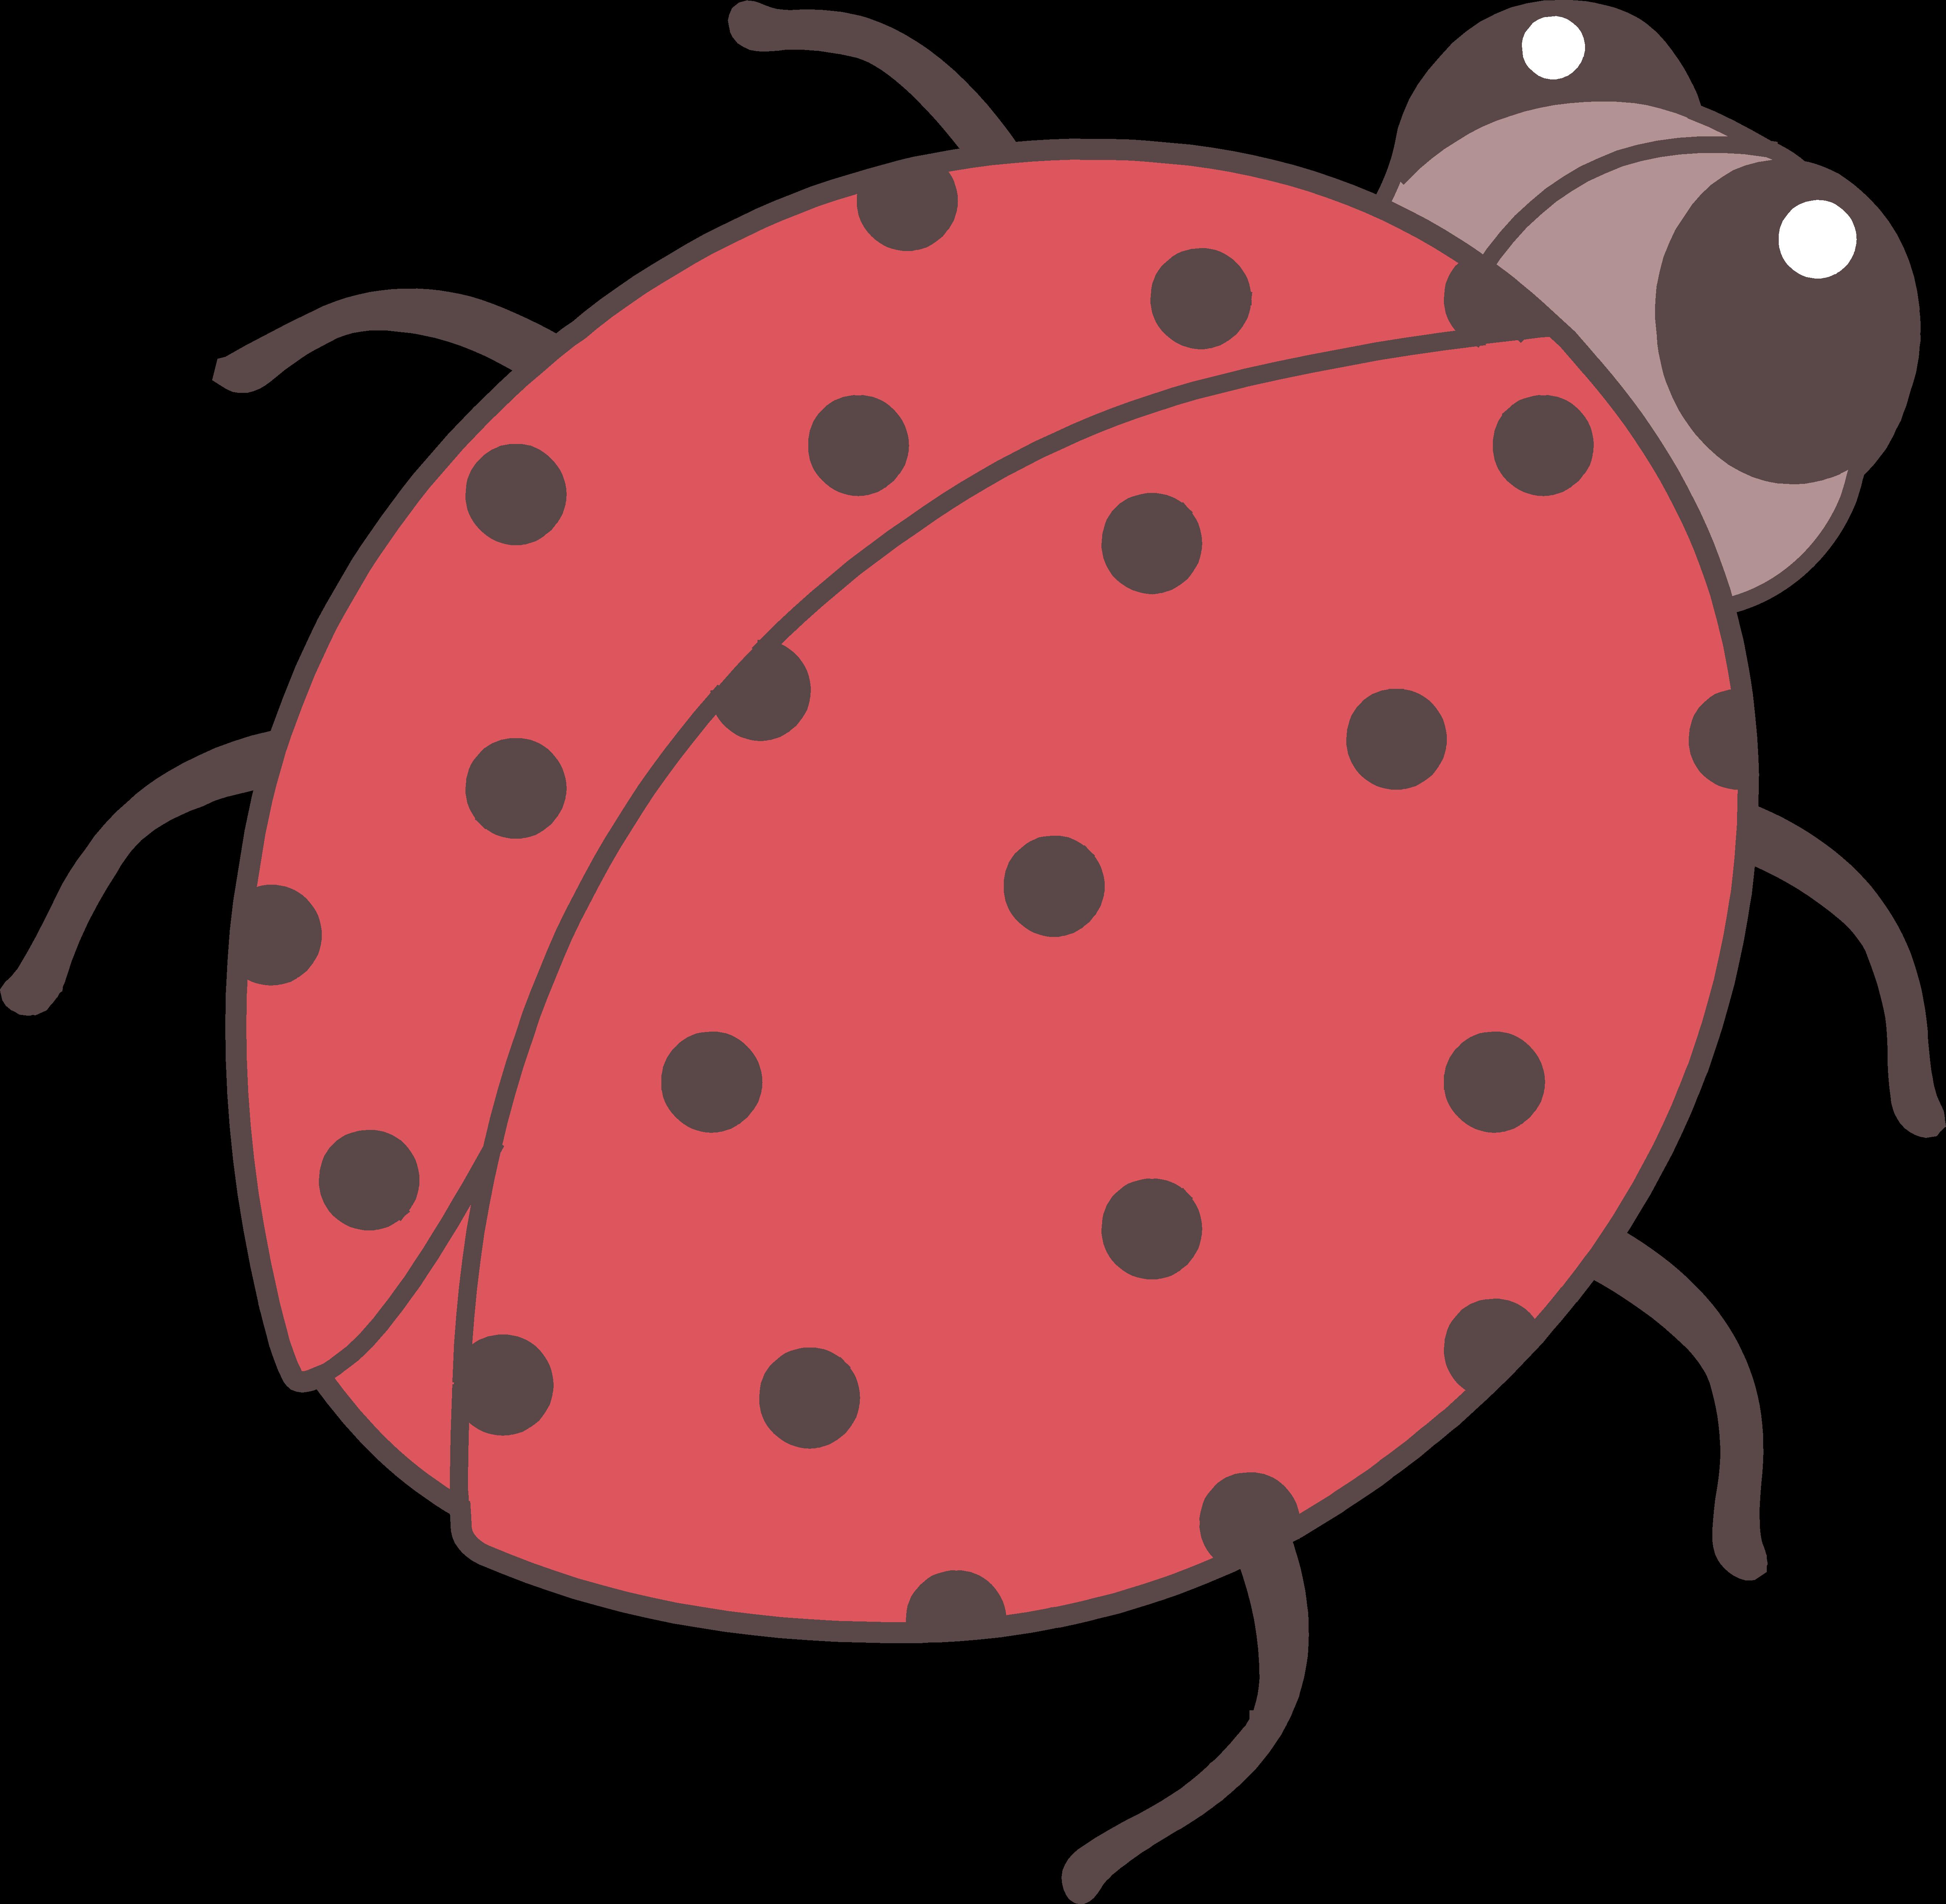 Ladybug clipart branch. Cute cliparts zone cartoon